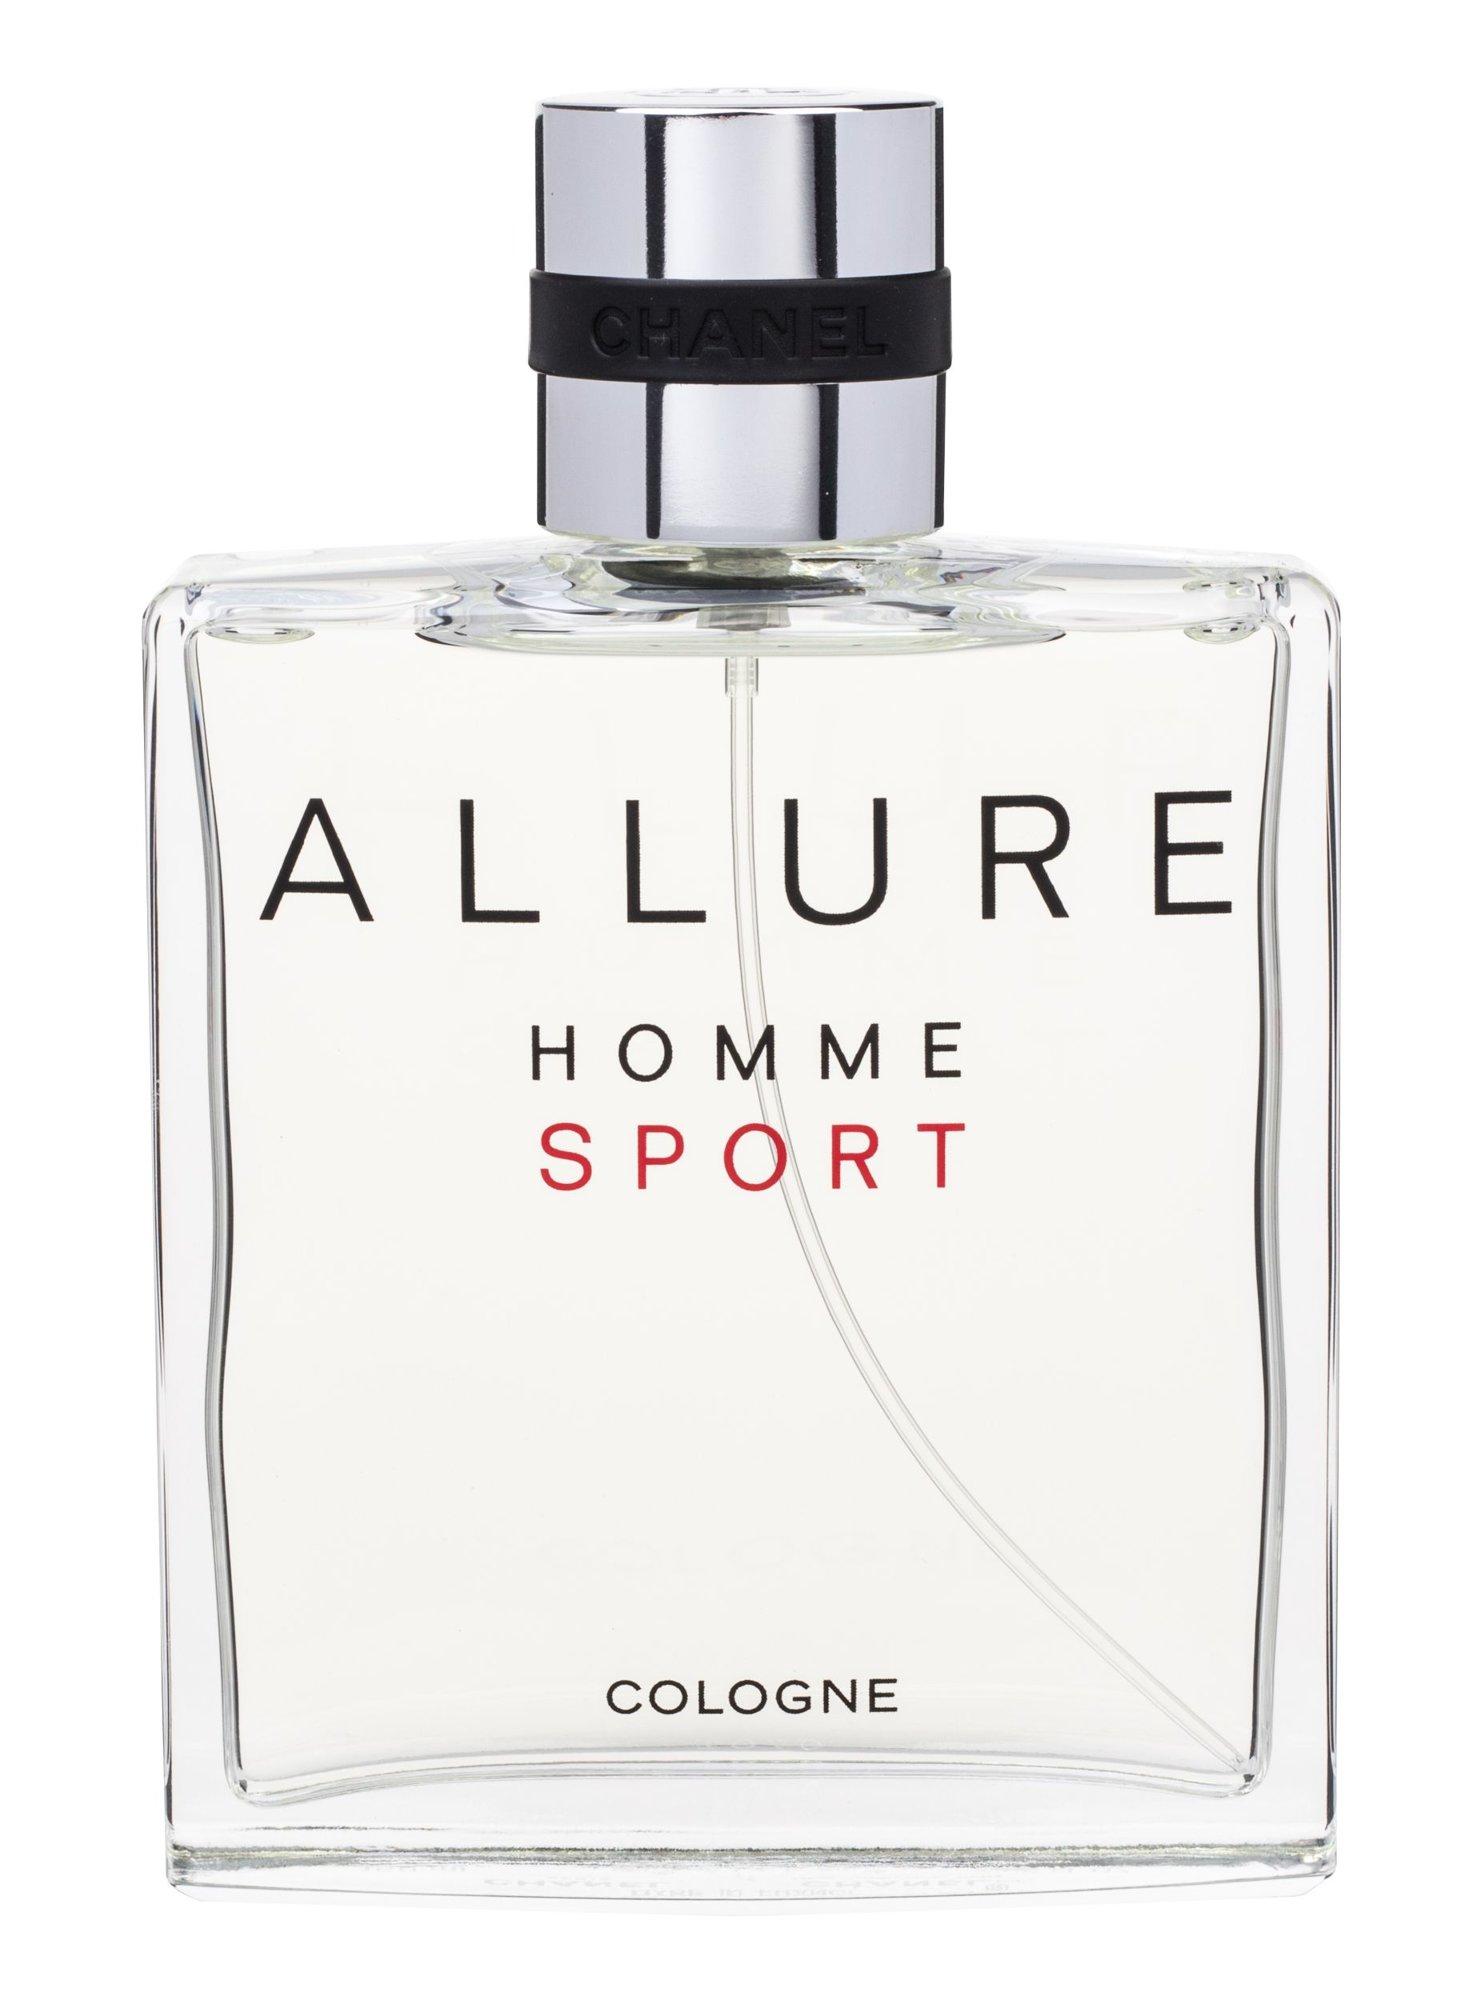 Chanel Allure Homme Sport Cologne Cologne 150ml